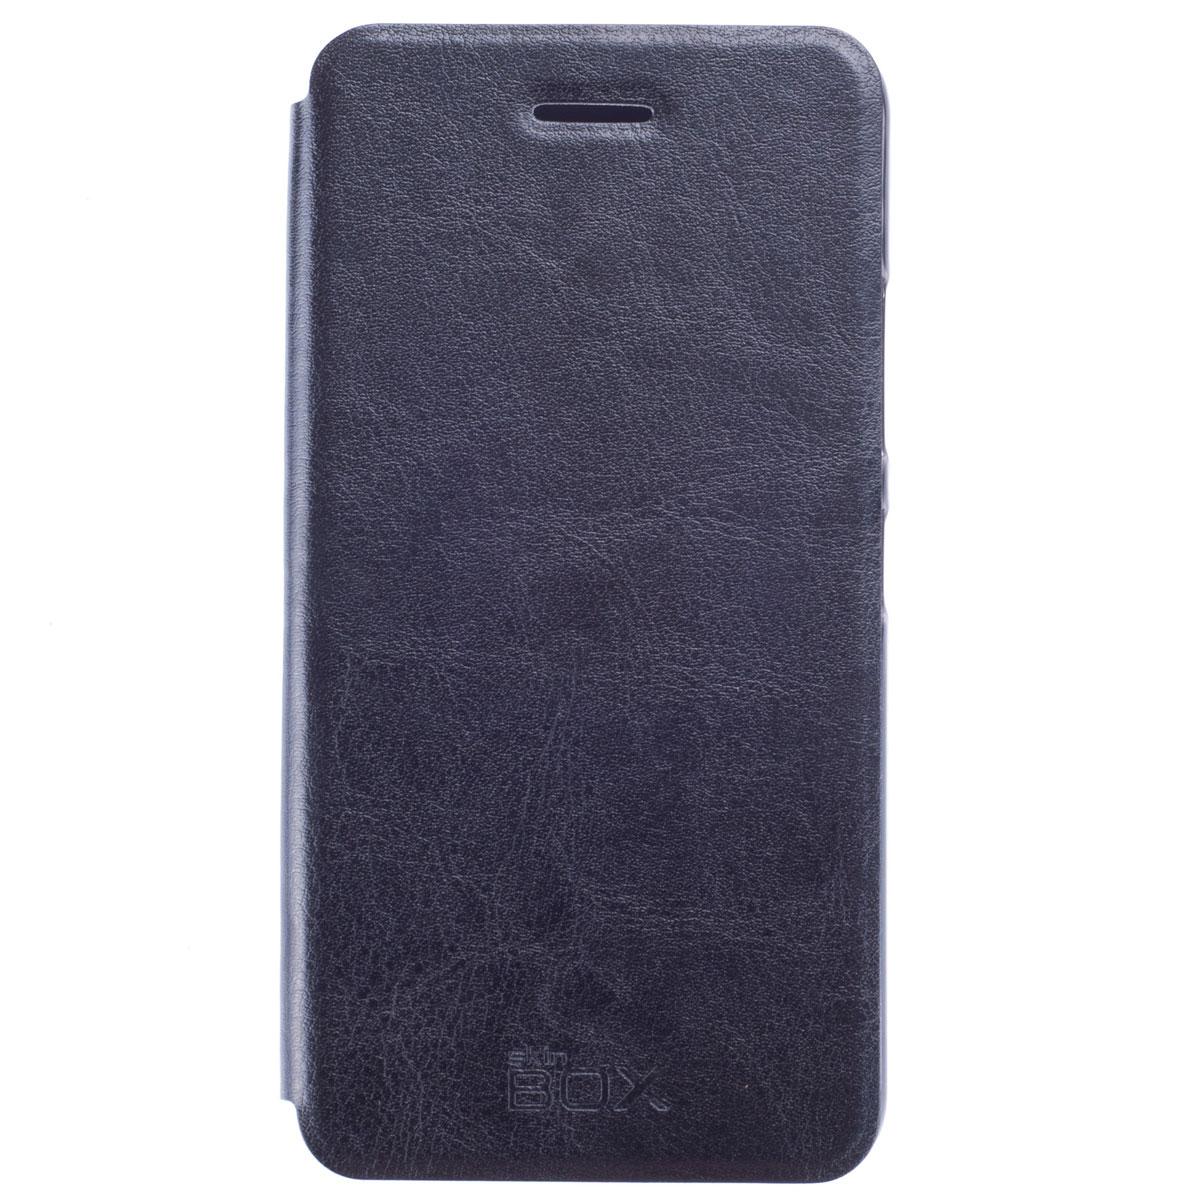 Skinbox Lux чехол для Lenovo S60, Black - Чехлы